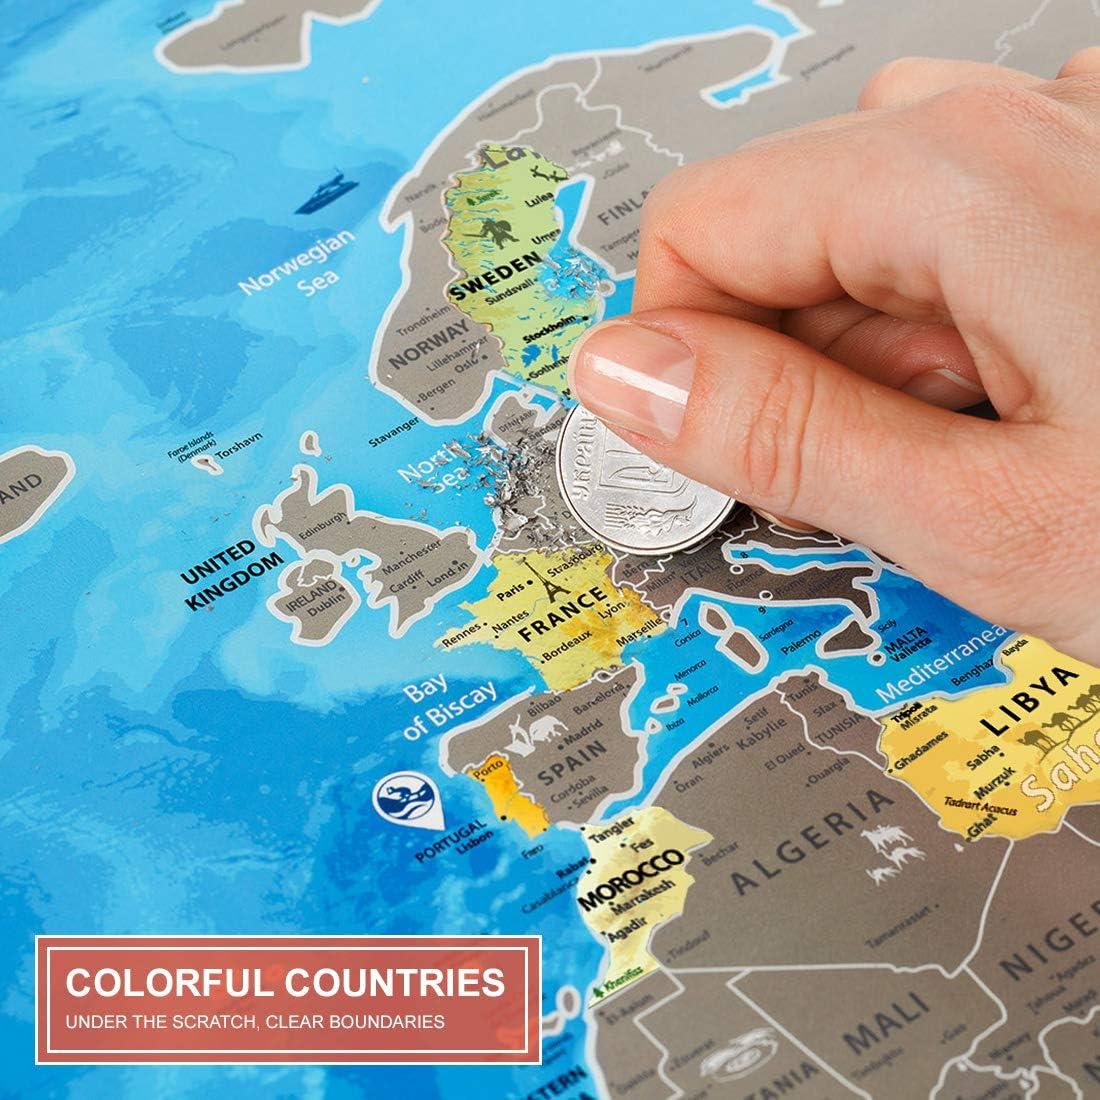 Mapa Mundi Rascar en el Marco Plateado - Mapa del Mundo para Raspar Grande Detallado 88 x 62 cm - Mapamundi Rasca - Scratch off World Travel Map Poster - Carta para